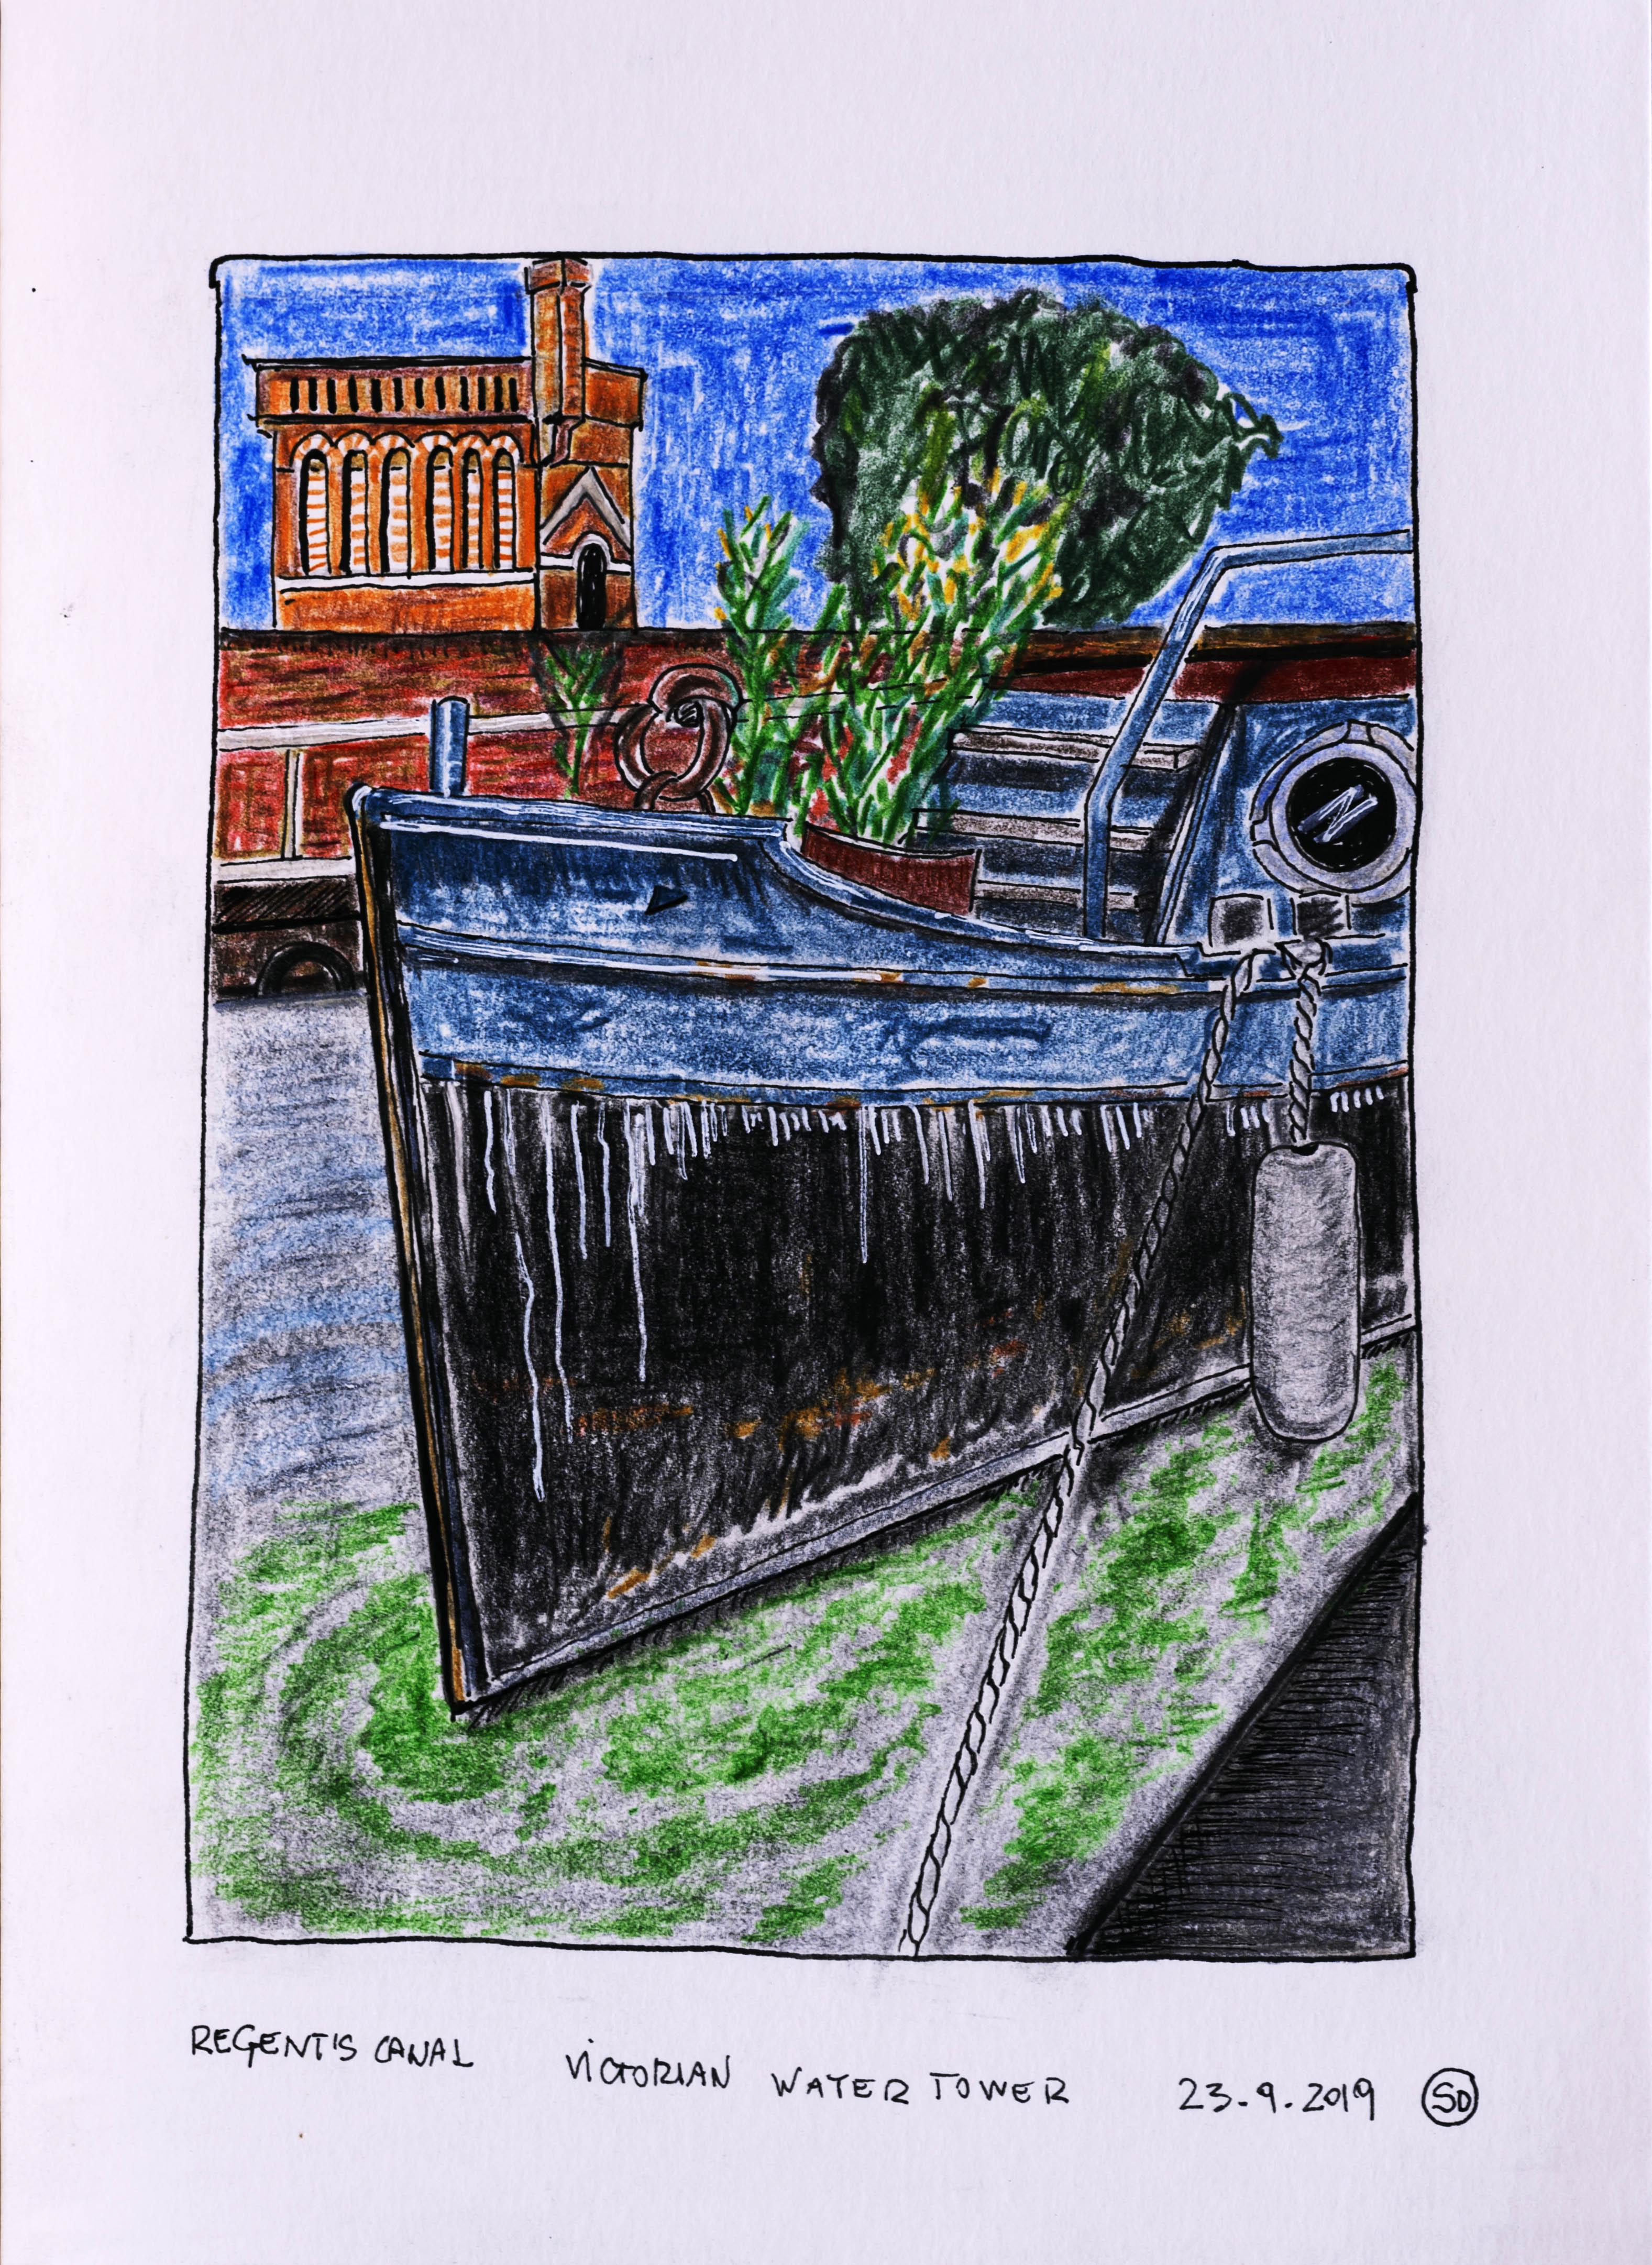 London Regents Canal